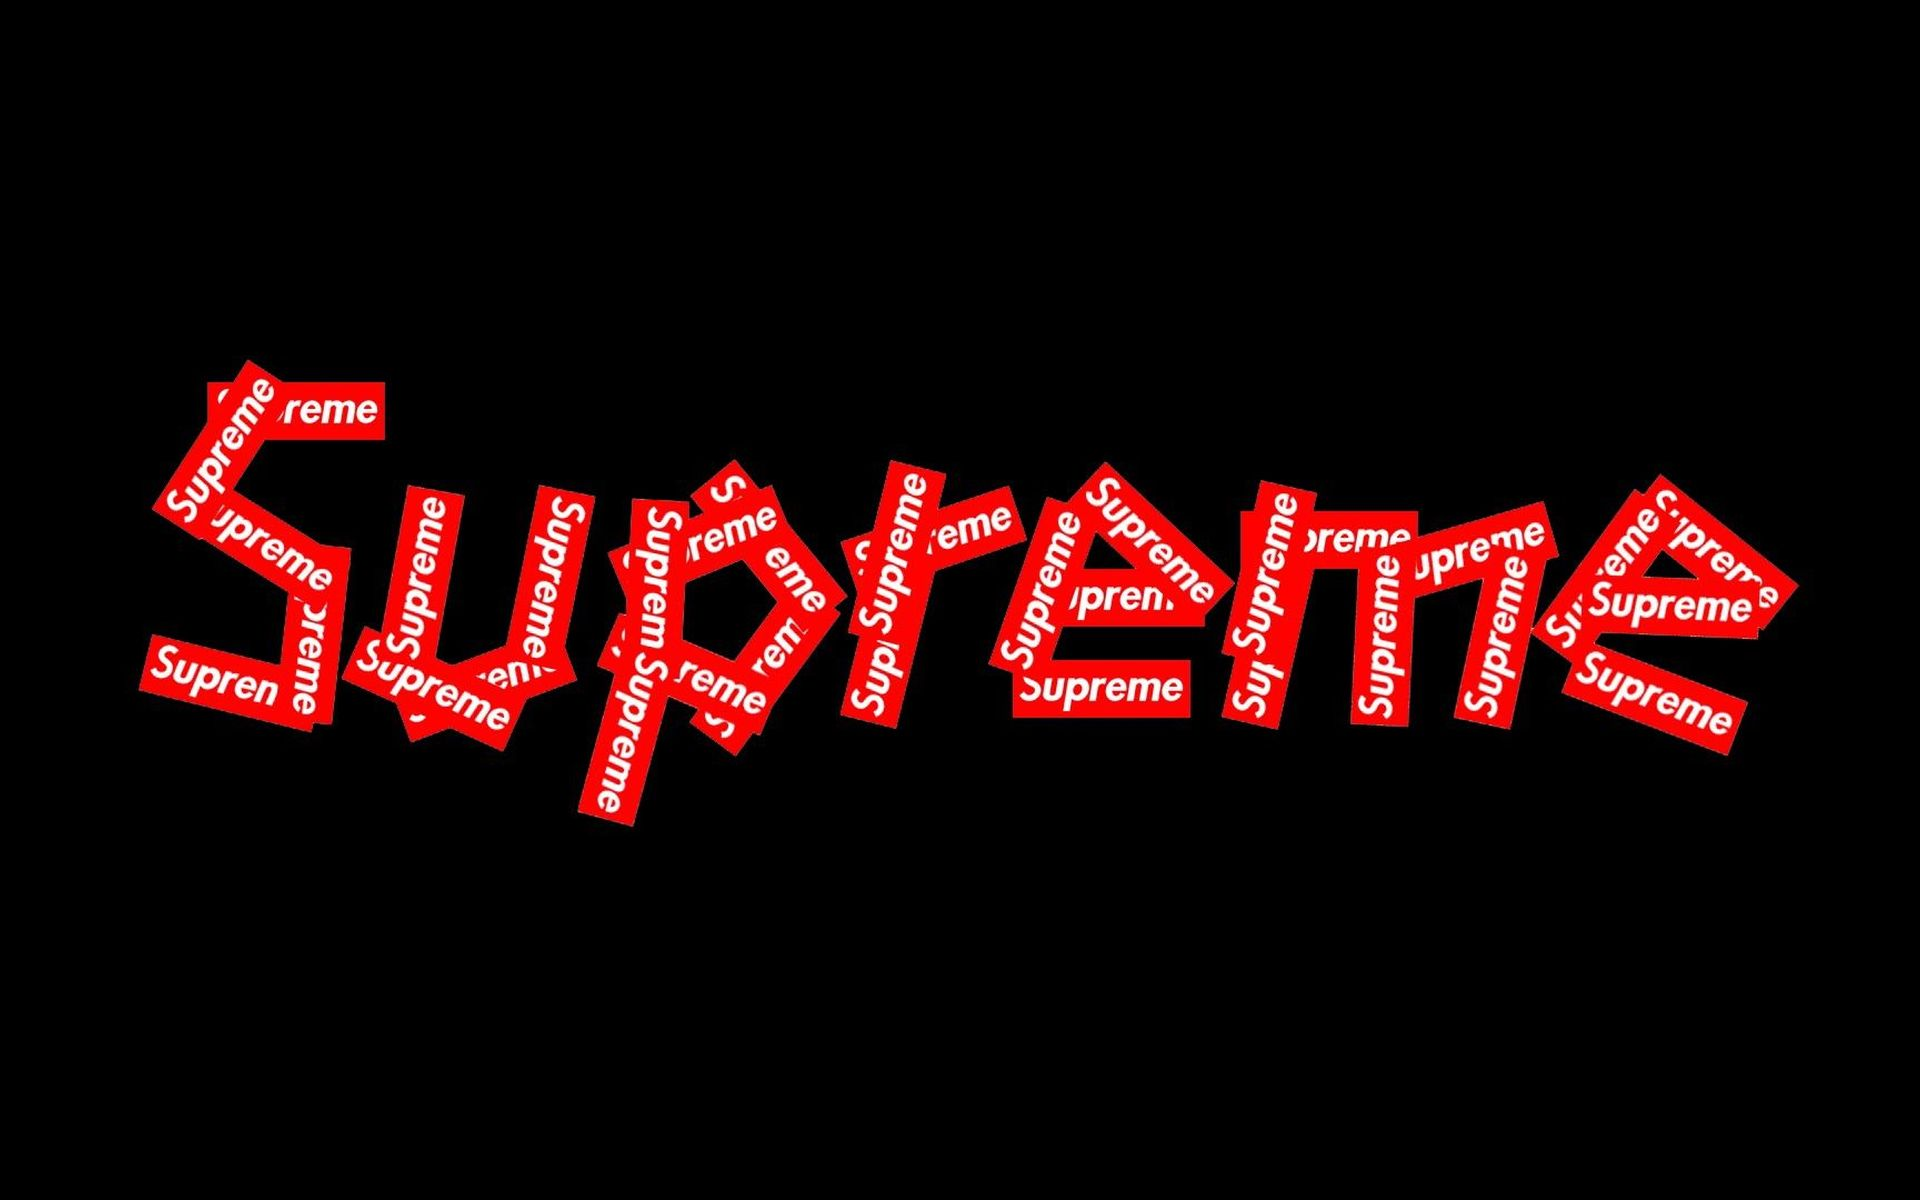 Supreme Laptop Wallpapers Supreme 1080p Background   Supreme Mac 1920x1200